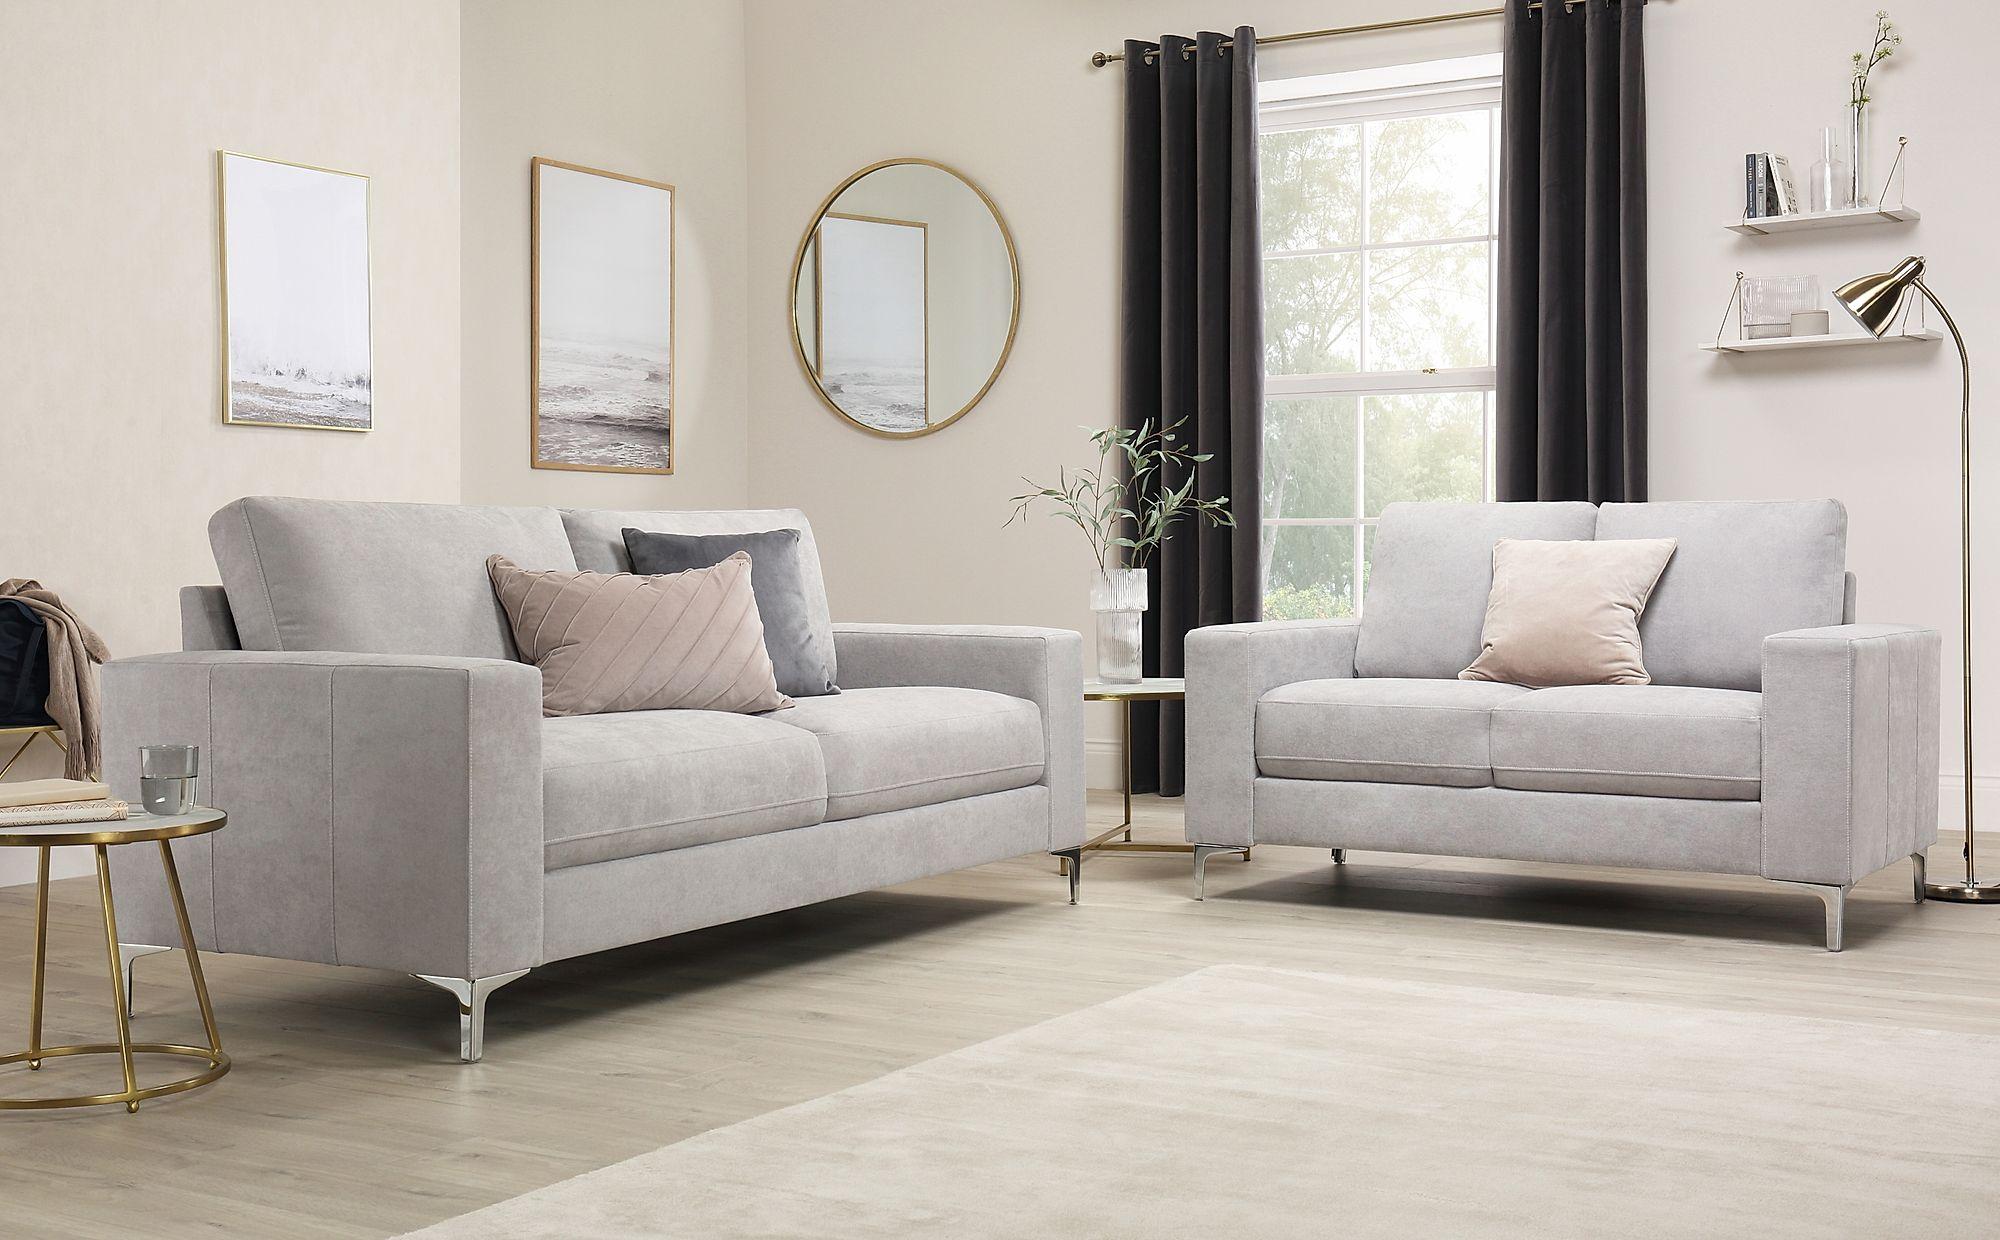 eef949856e Baltimore Dove Grey Plush Fabric Sofa 3+2 Seater Only £699.98 ...